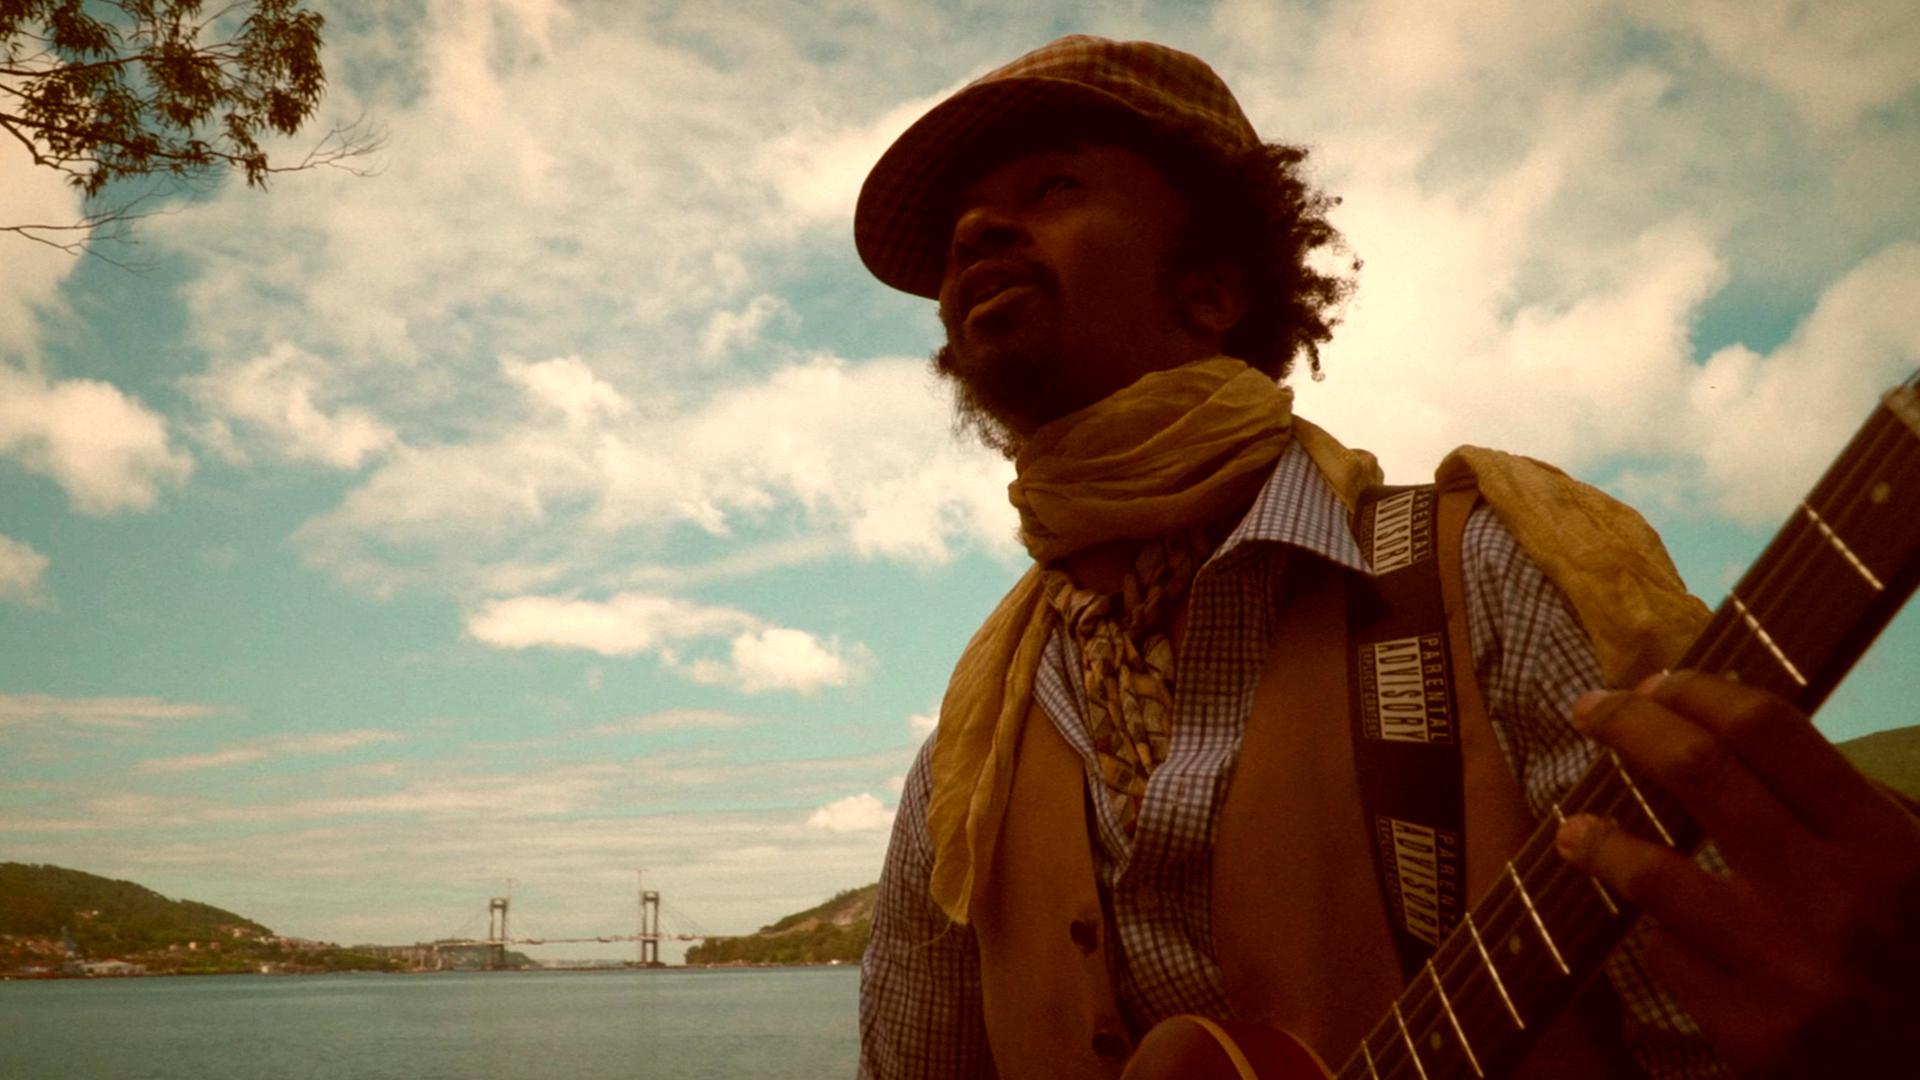 Temporada 3 Fantastic Negrito - In the Pines (Oakland)